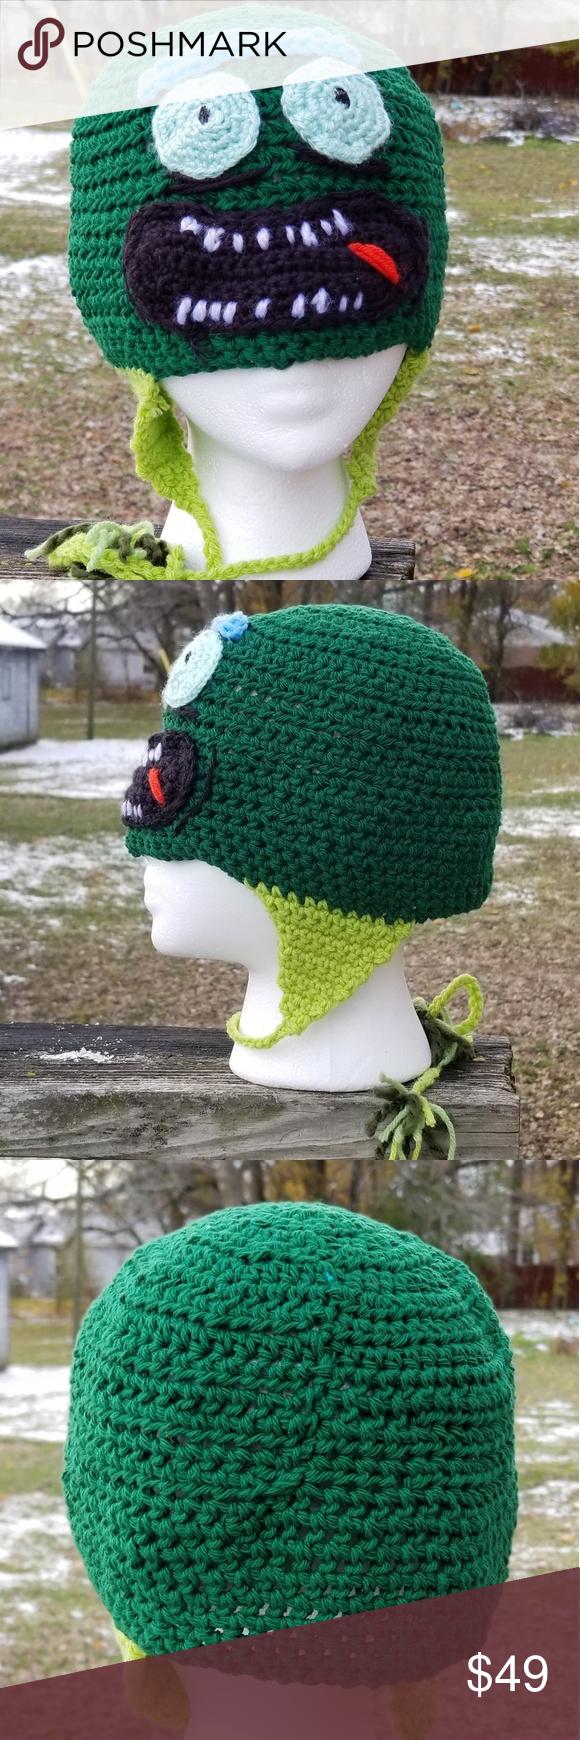 Pickle Rick Crochet Character Hat Handmade Crochet Character Hats Crochet Rick And Morty Hat